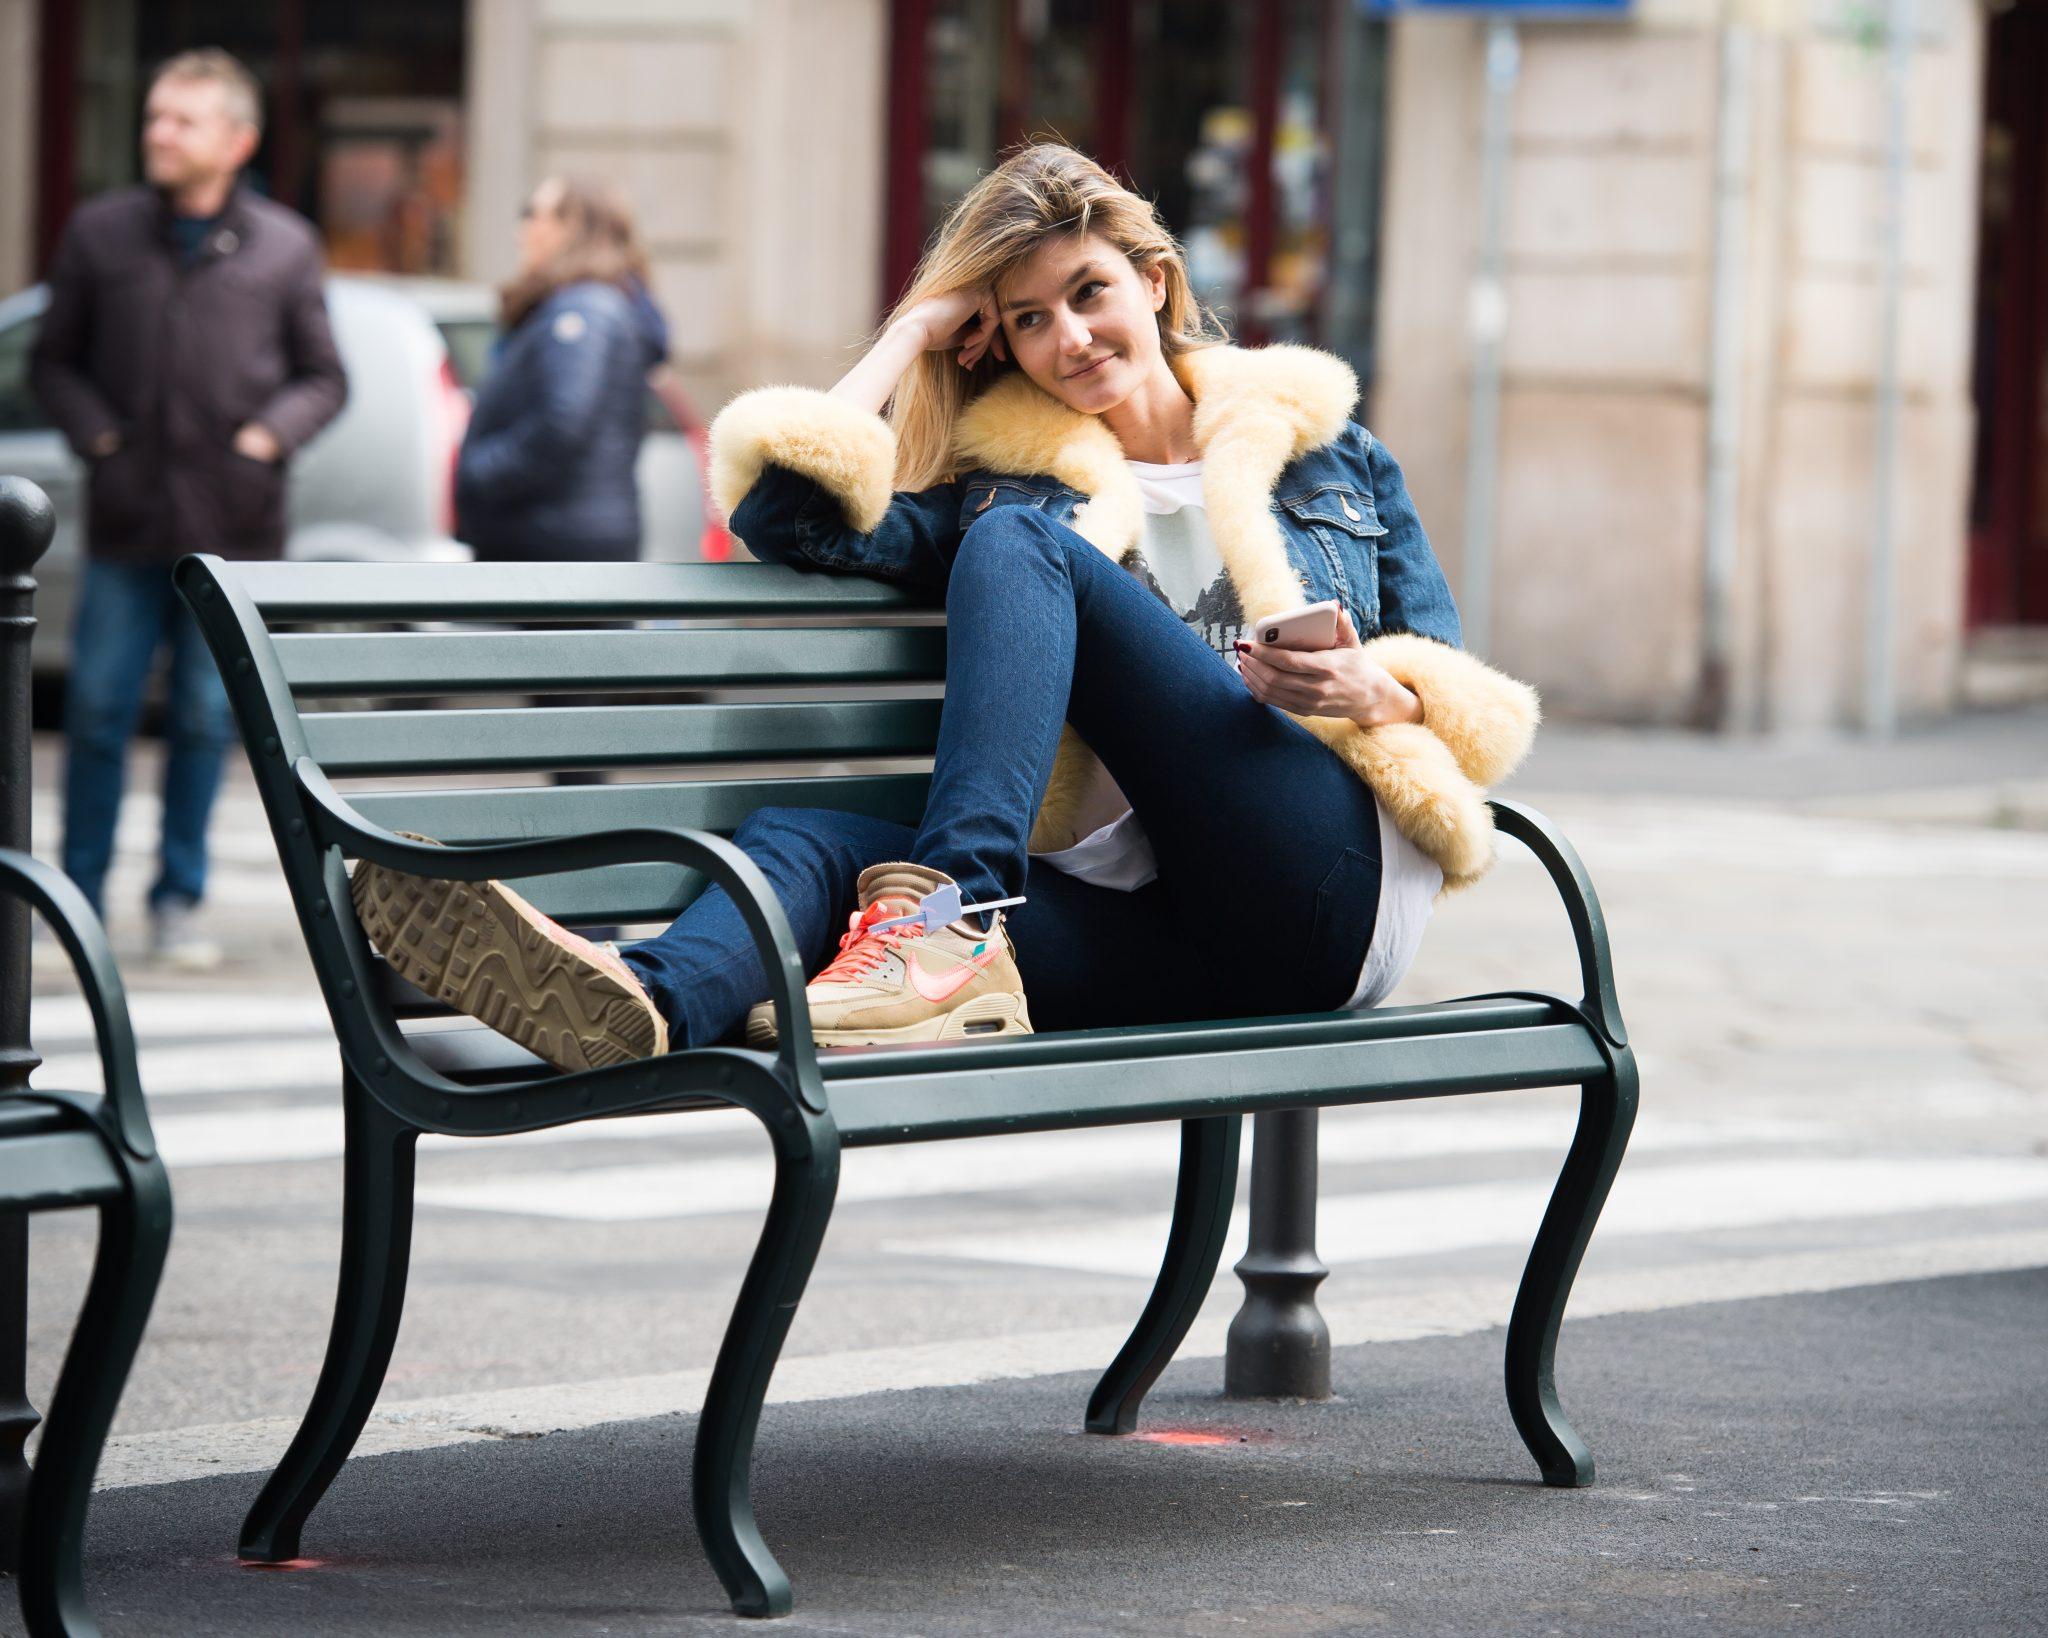 Maria Vittoria Cusumano - de carlis furs e scarpe yeezy